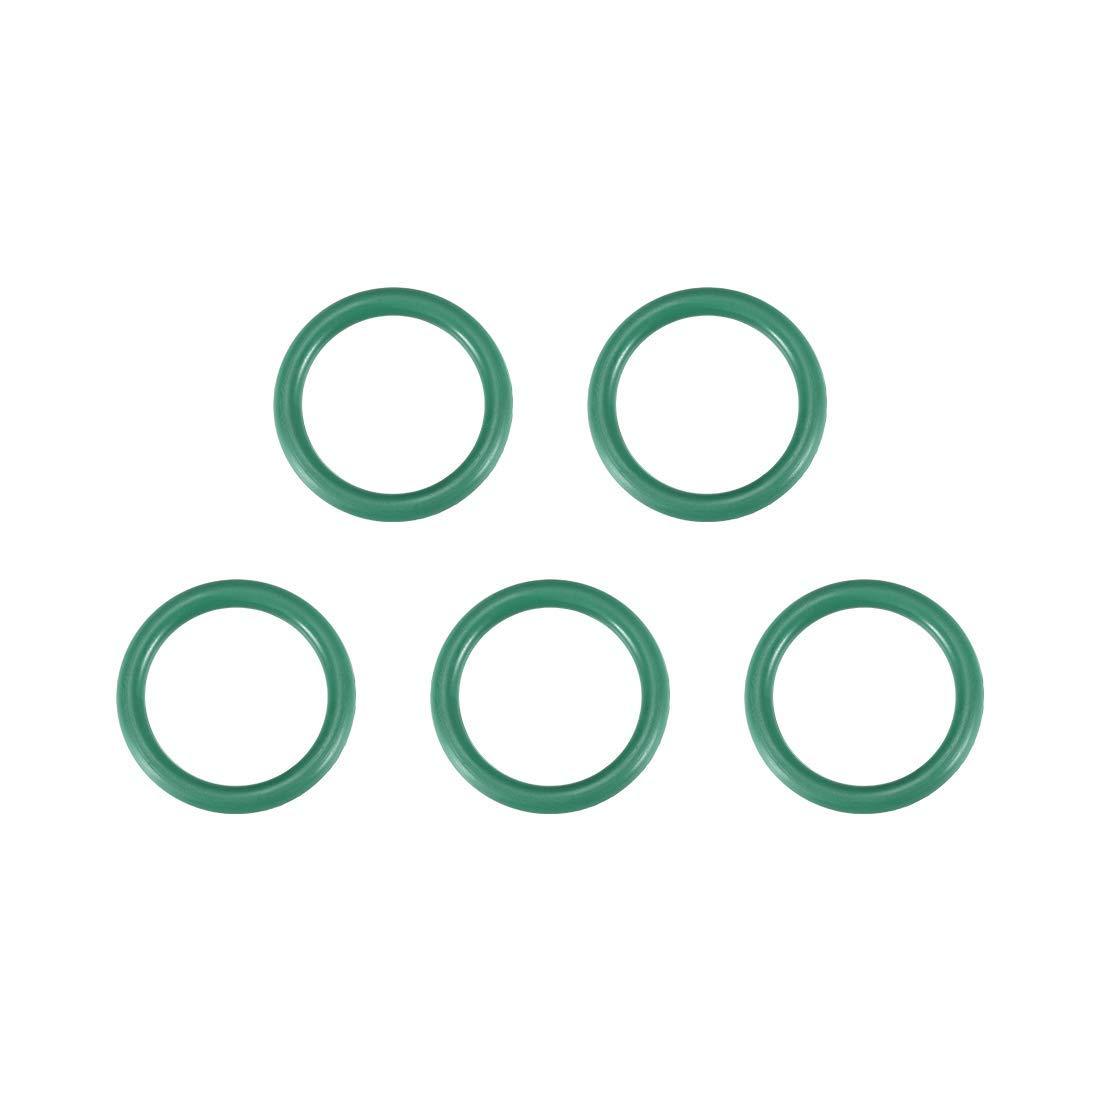 3.1mm Width Odor Rings of Fluorine Rubber 25.8mm Inner Diameter 5-Piece Green Seal 32mm Outer Diameter